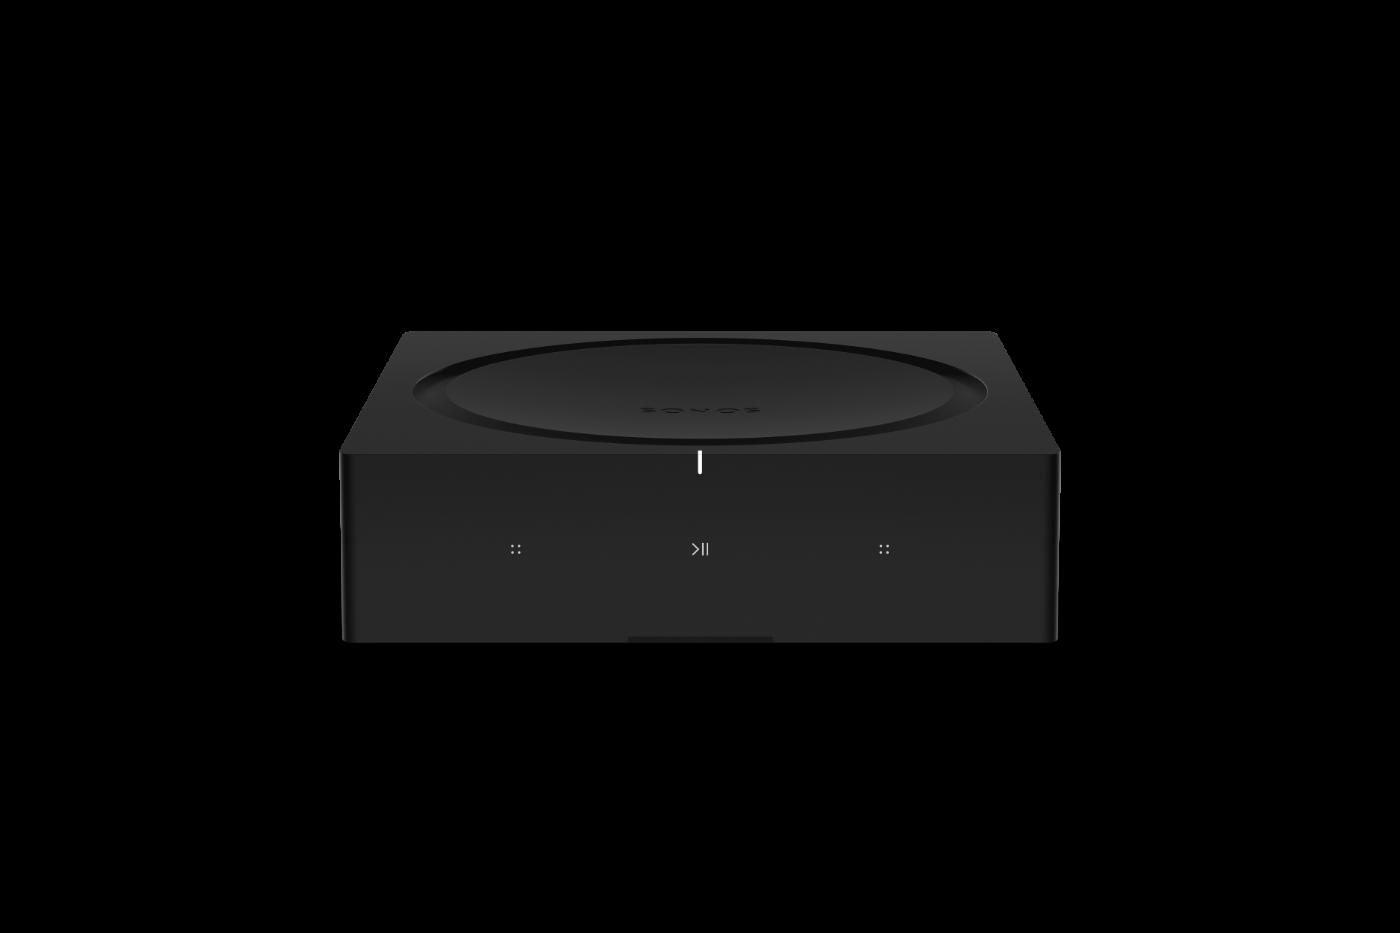 Amp-Product-Render-Front-Q1FY19_EN-US_ART_fid4348